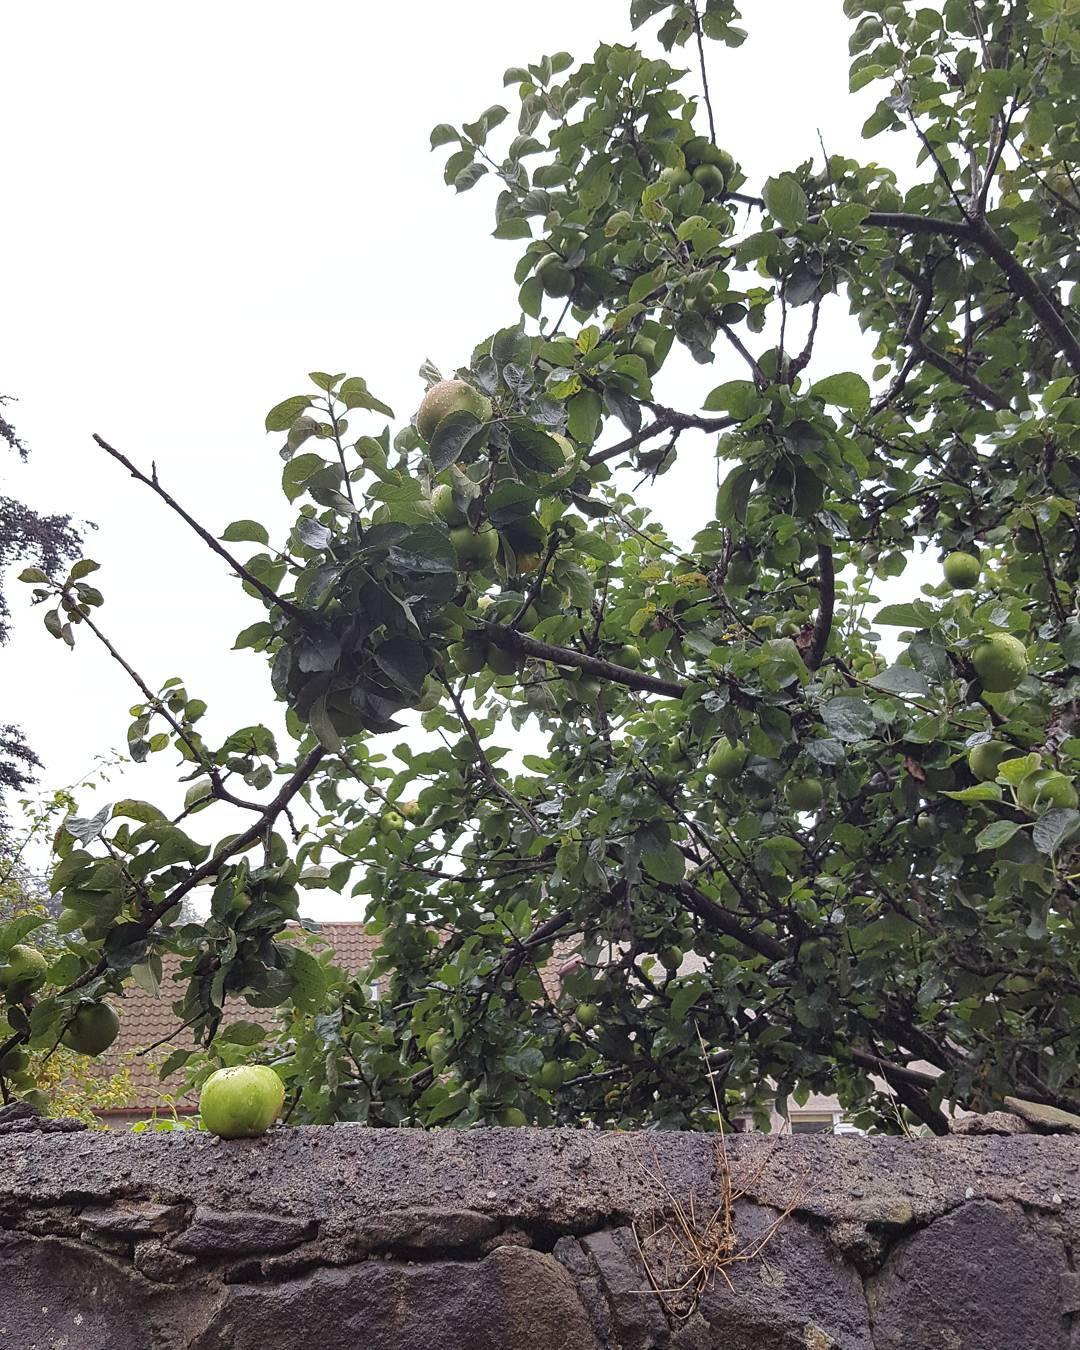 Jane saw the perfectly ripe apple sitting on the wallhellip